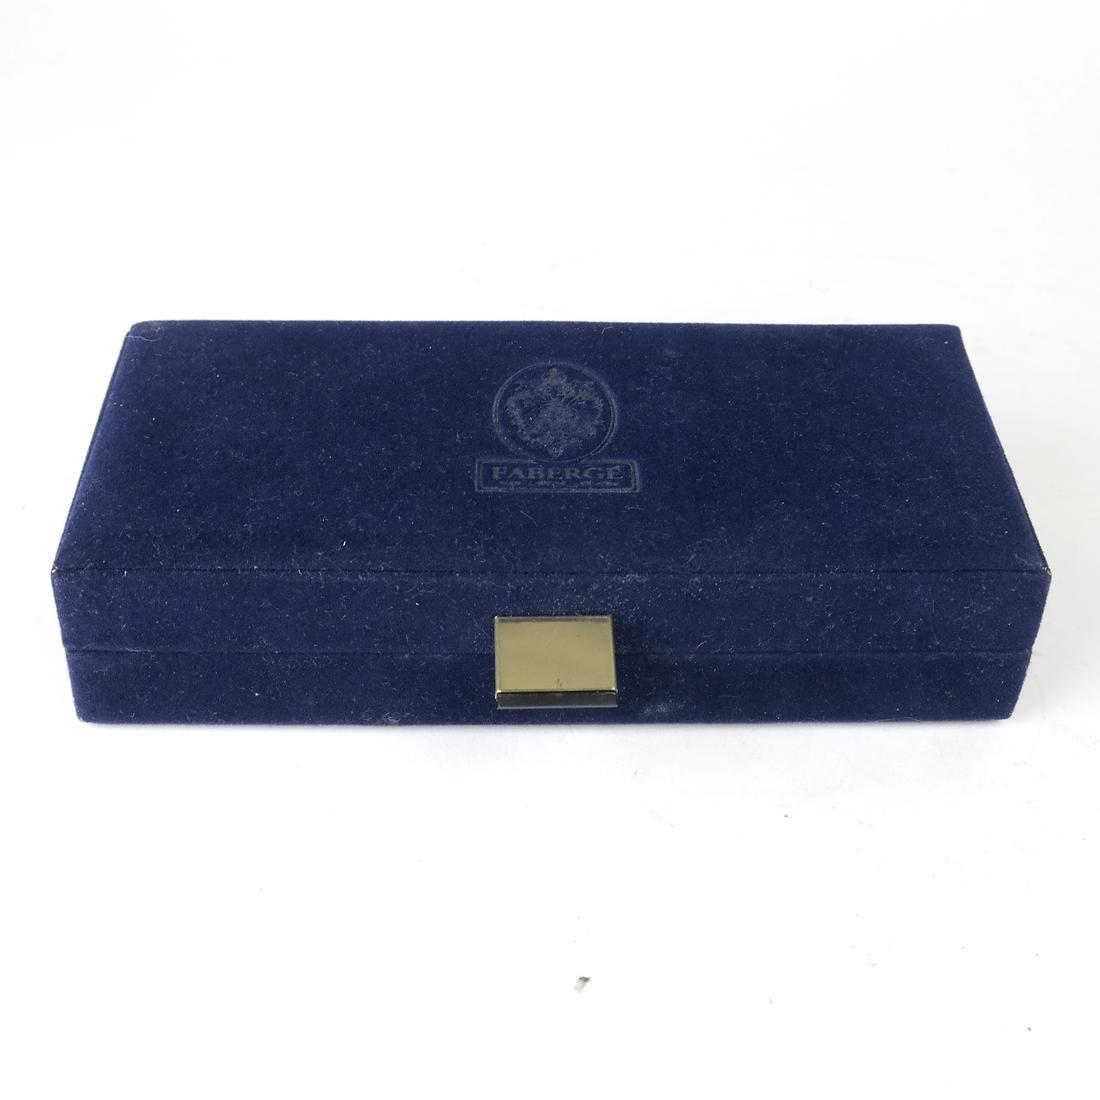 Six Wine Glass Charms, Fabergé - 8